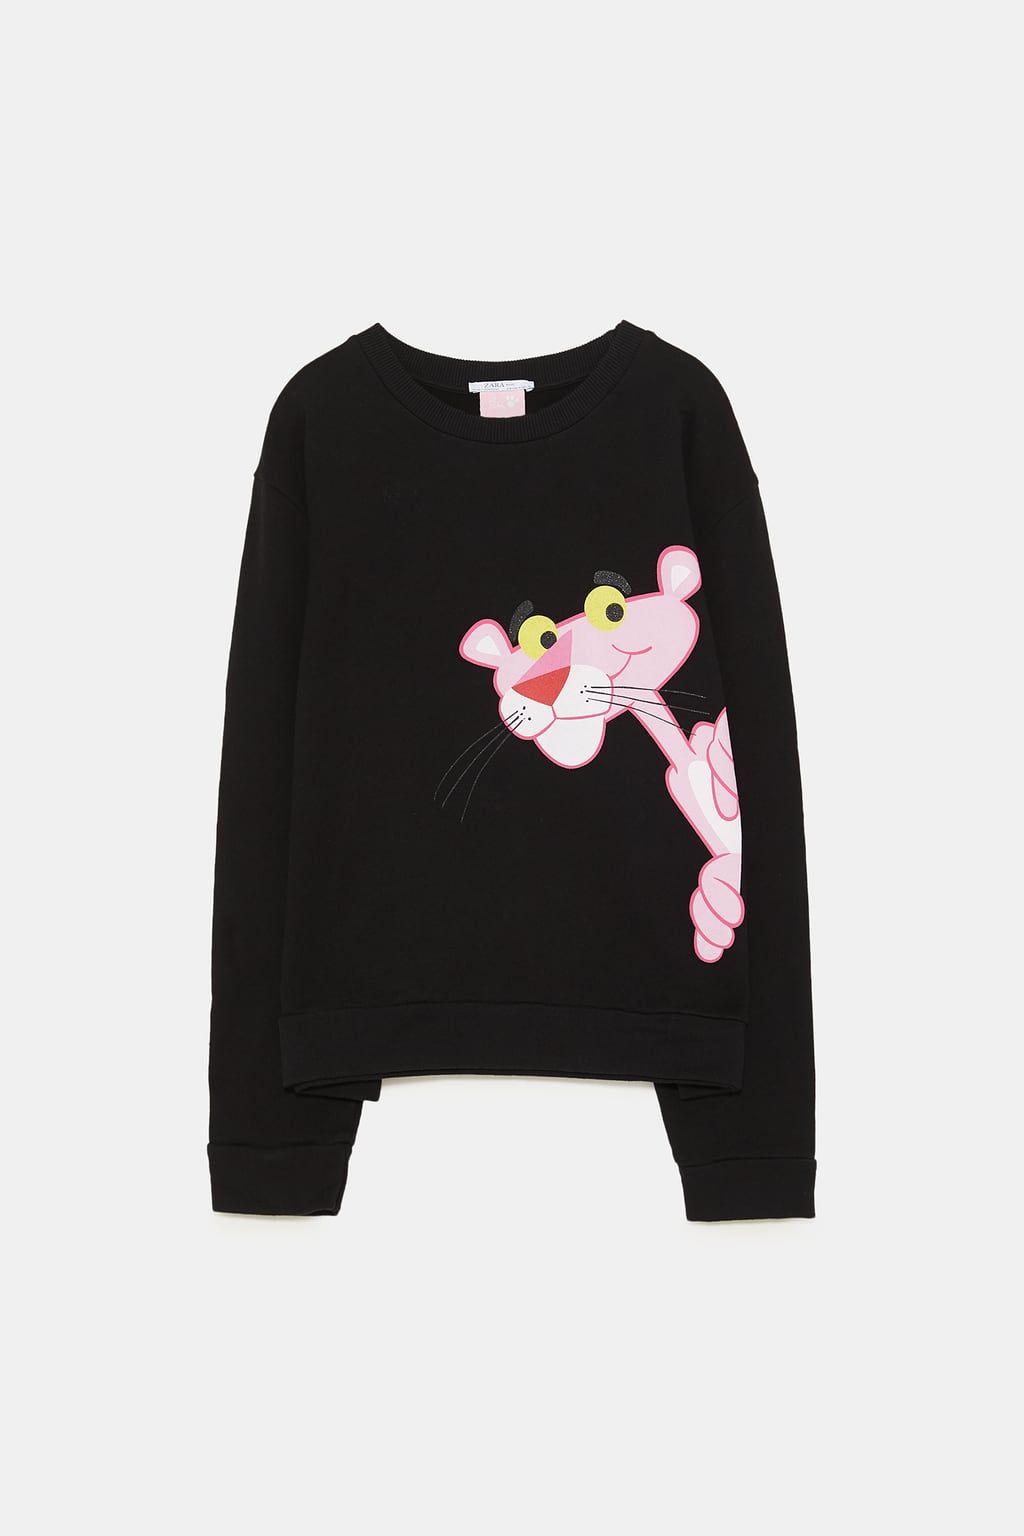 Image 8 De Sweat Panthère Rose De Zara Stylish Hoodies Sweatshirts Fashion Baby Girl Outfits